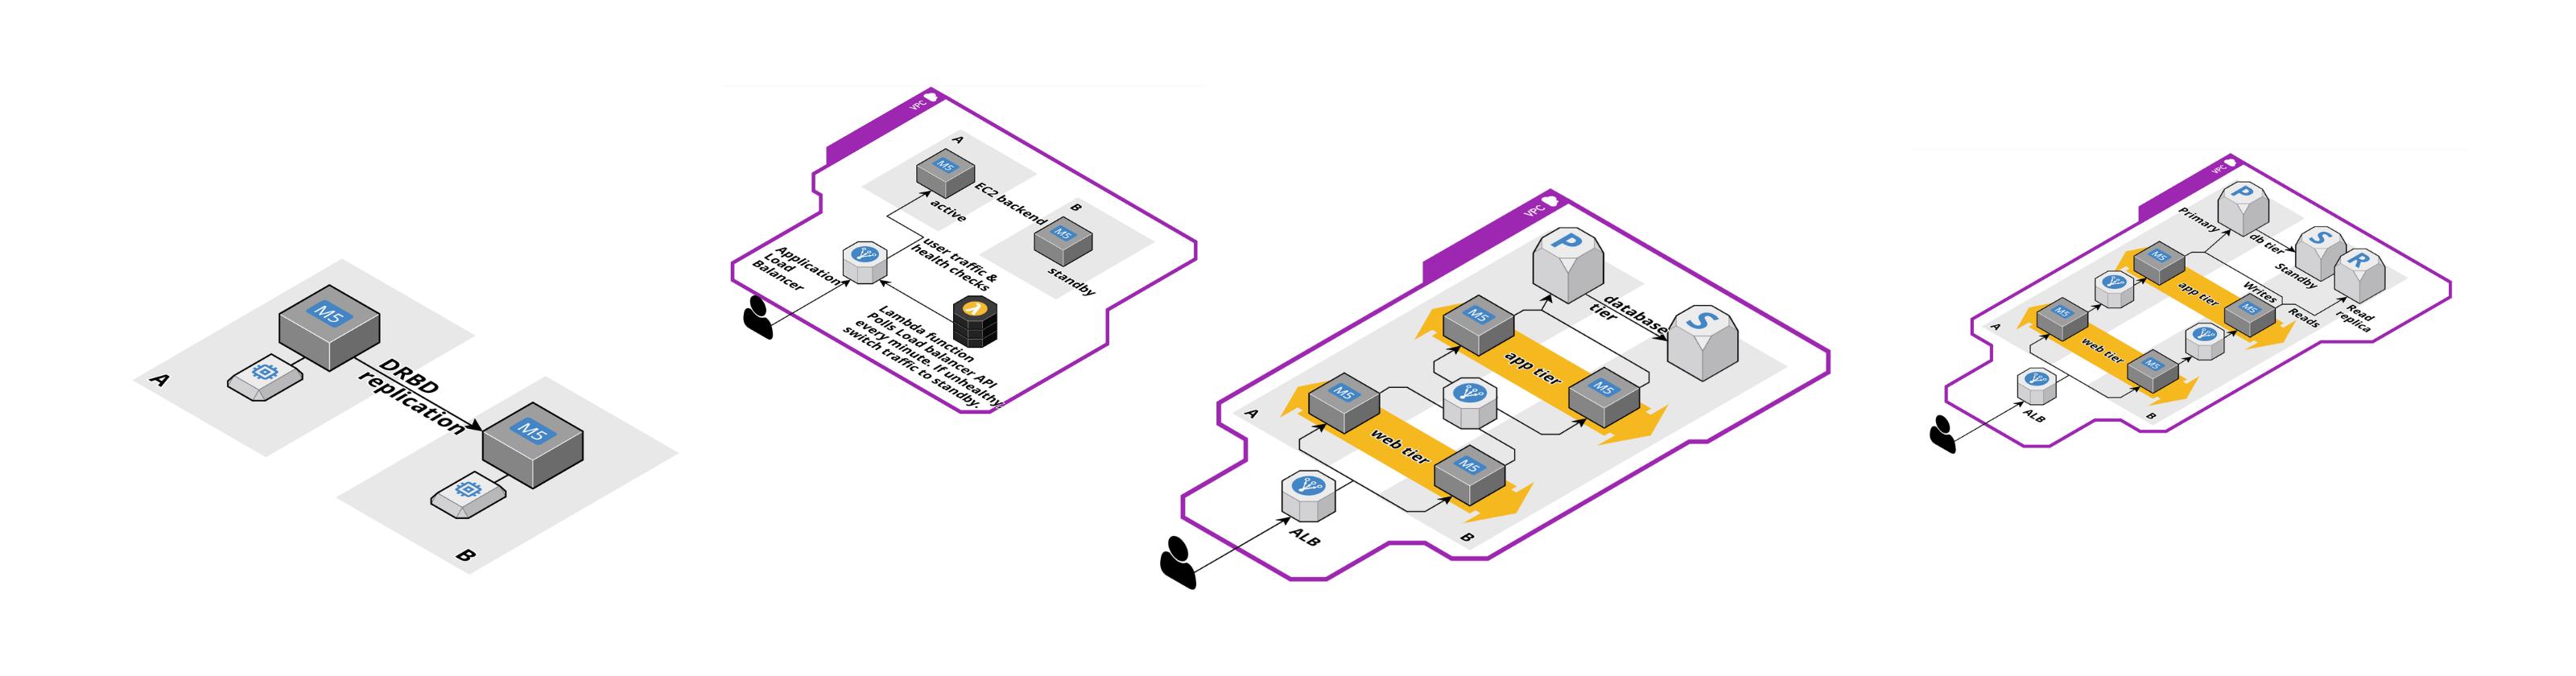 Unusual AWS architectures